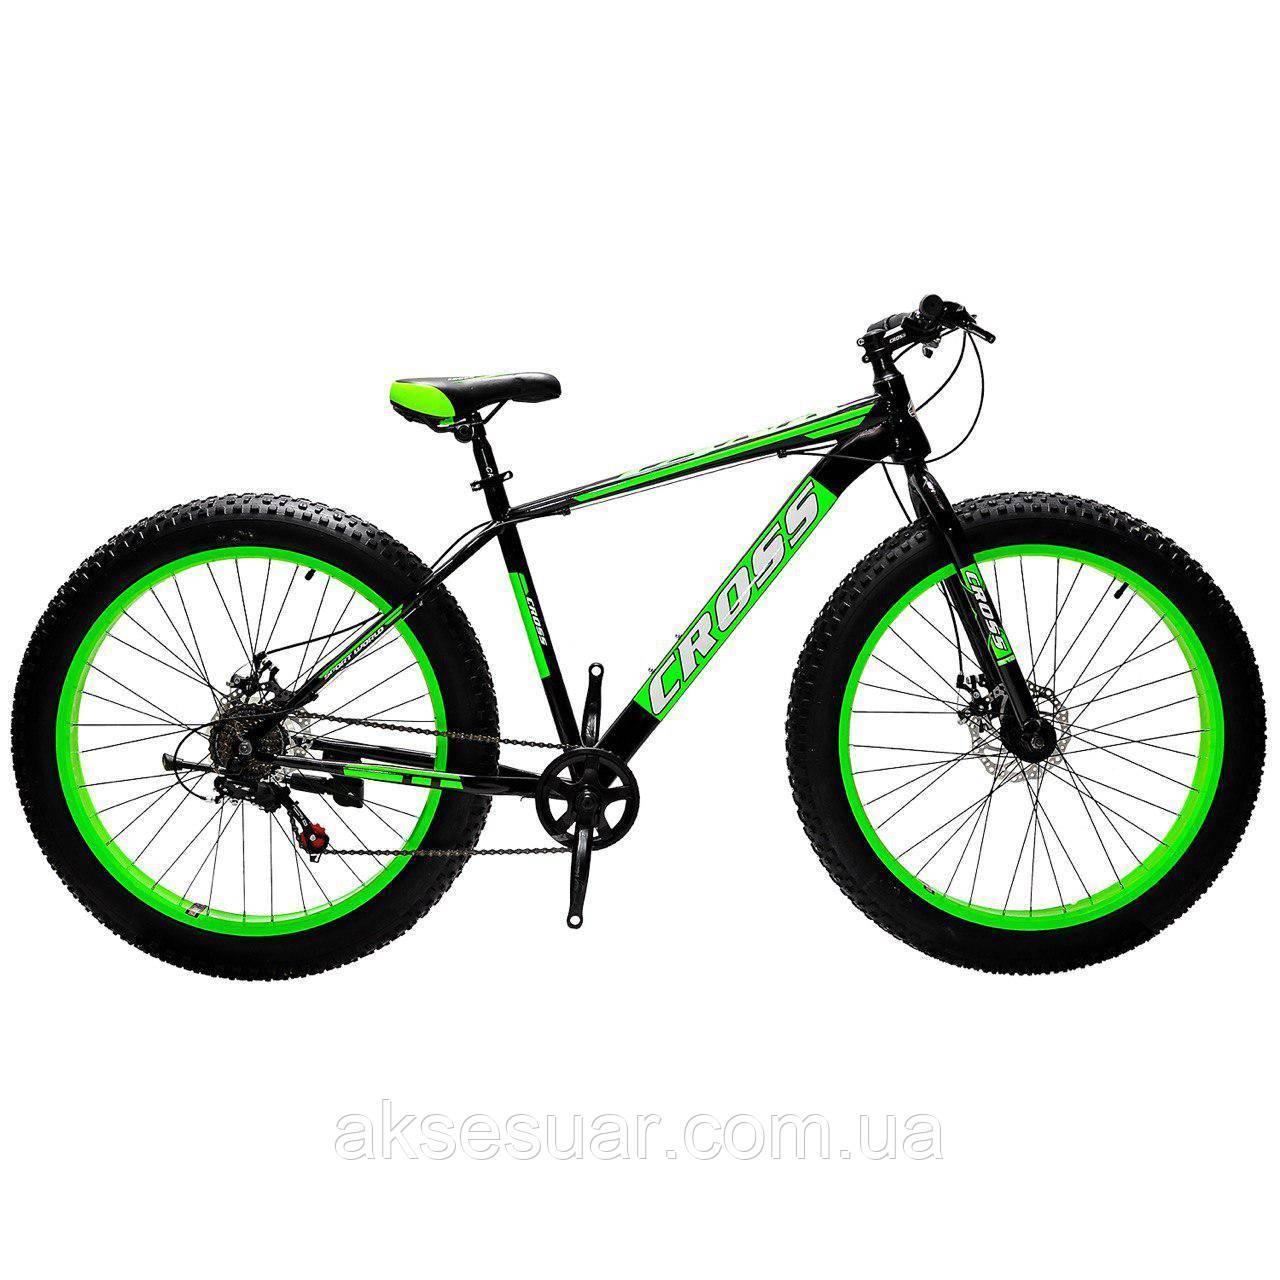 Велосипед Фэтбайк Сross-Tank 26, фото 1